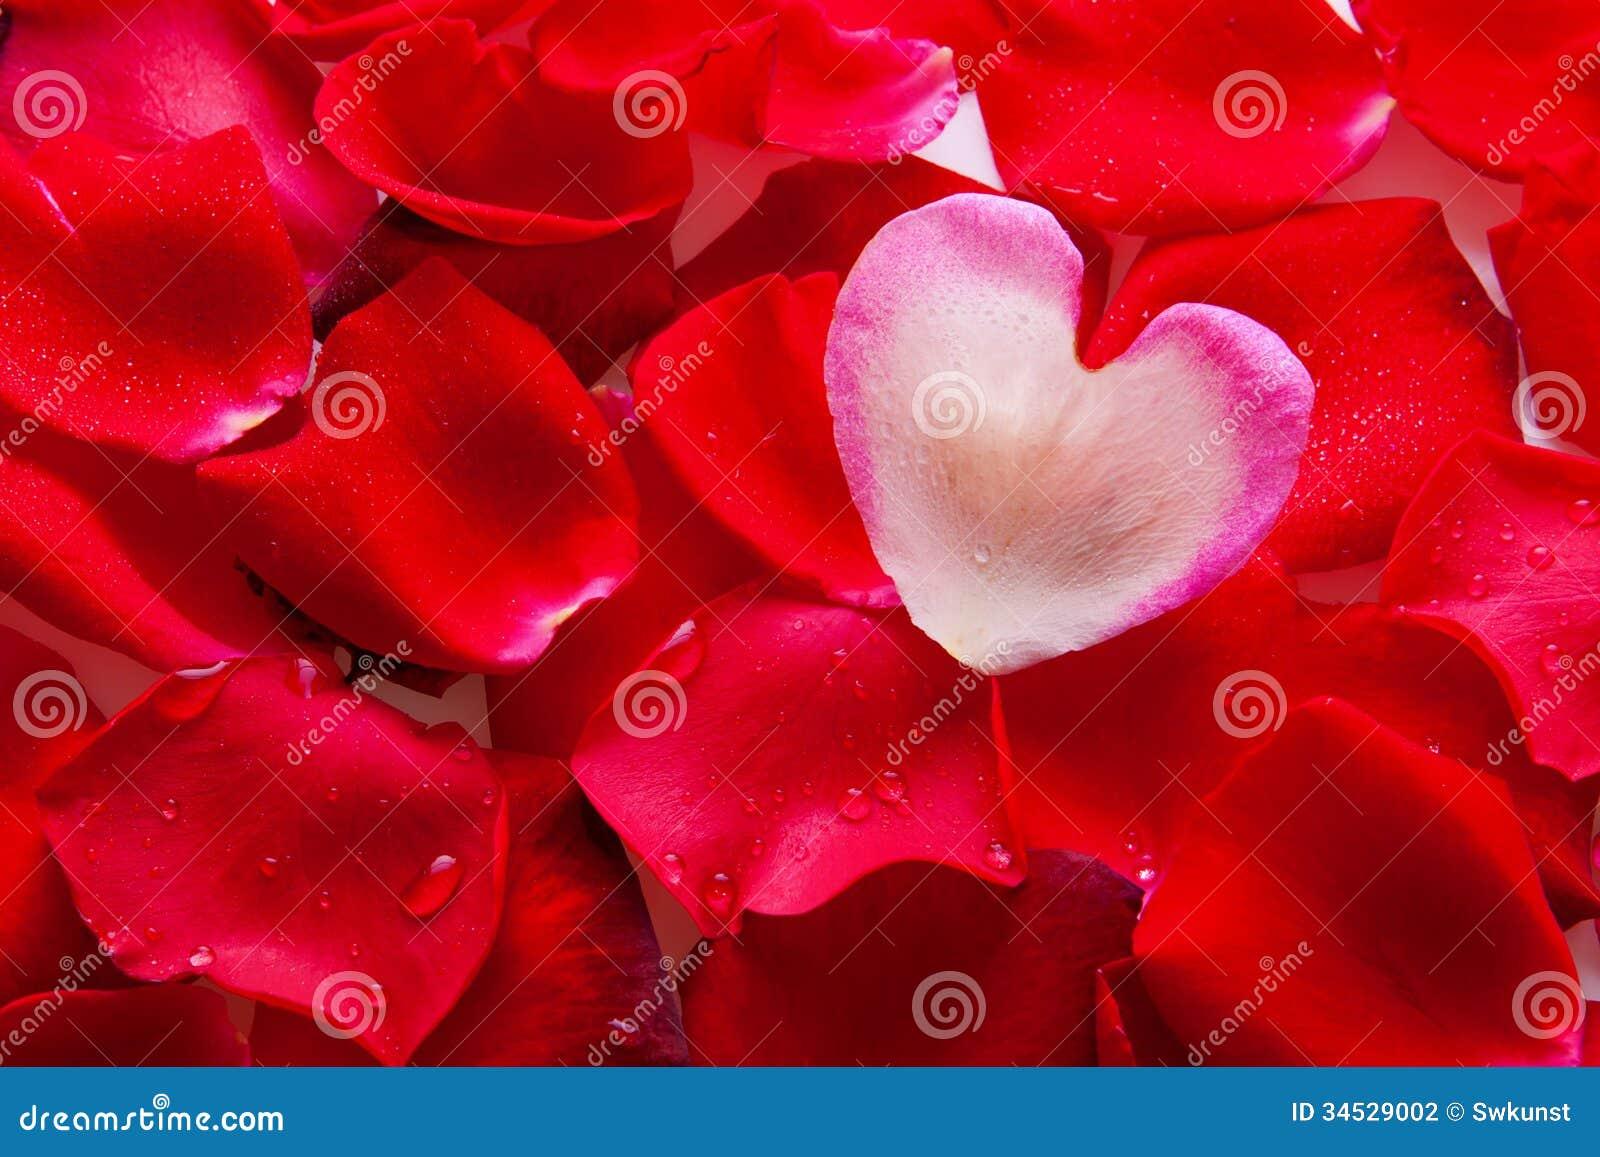 valentine rose petals heart. royalty free stock photo  image, Beautiful flower